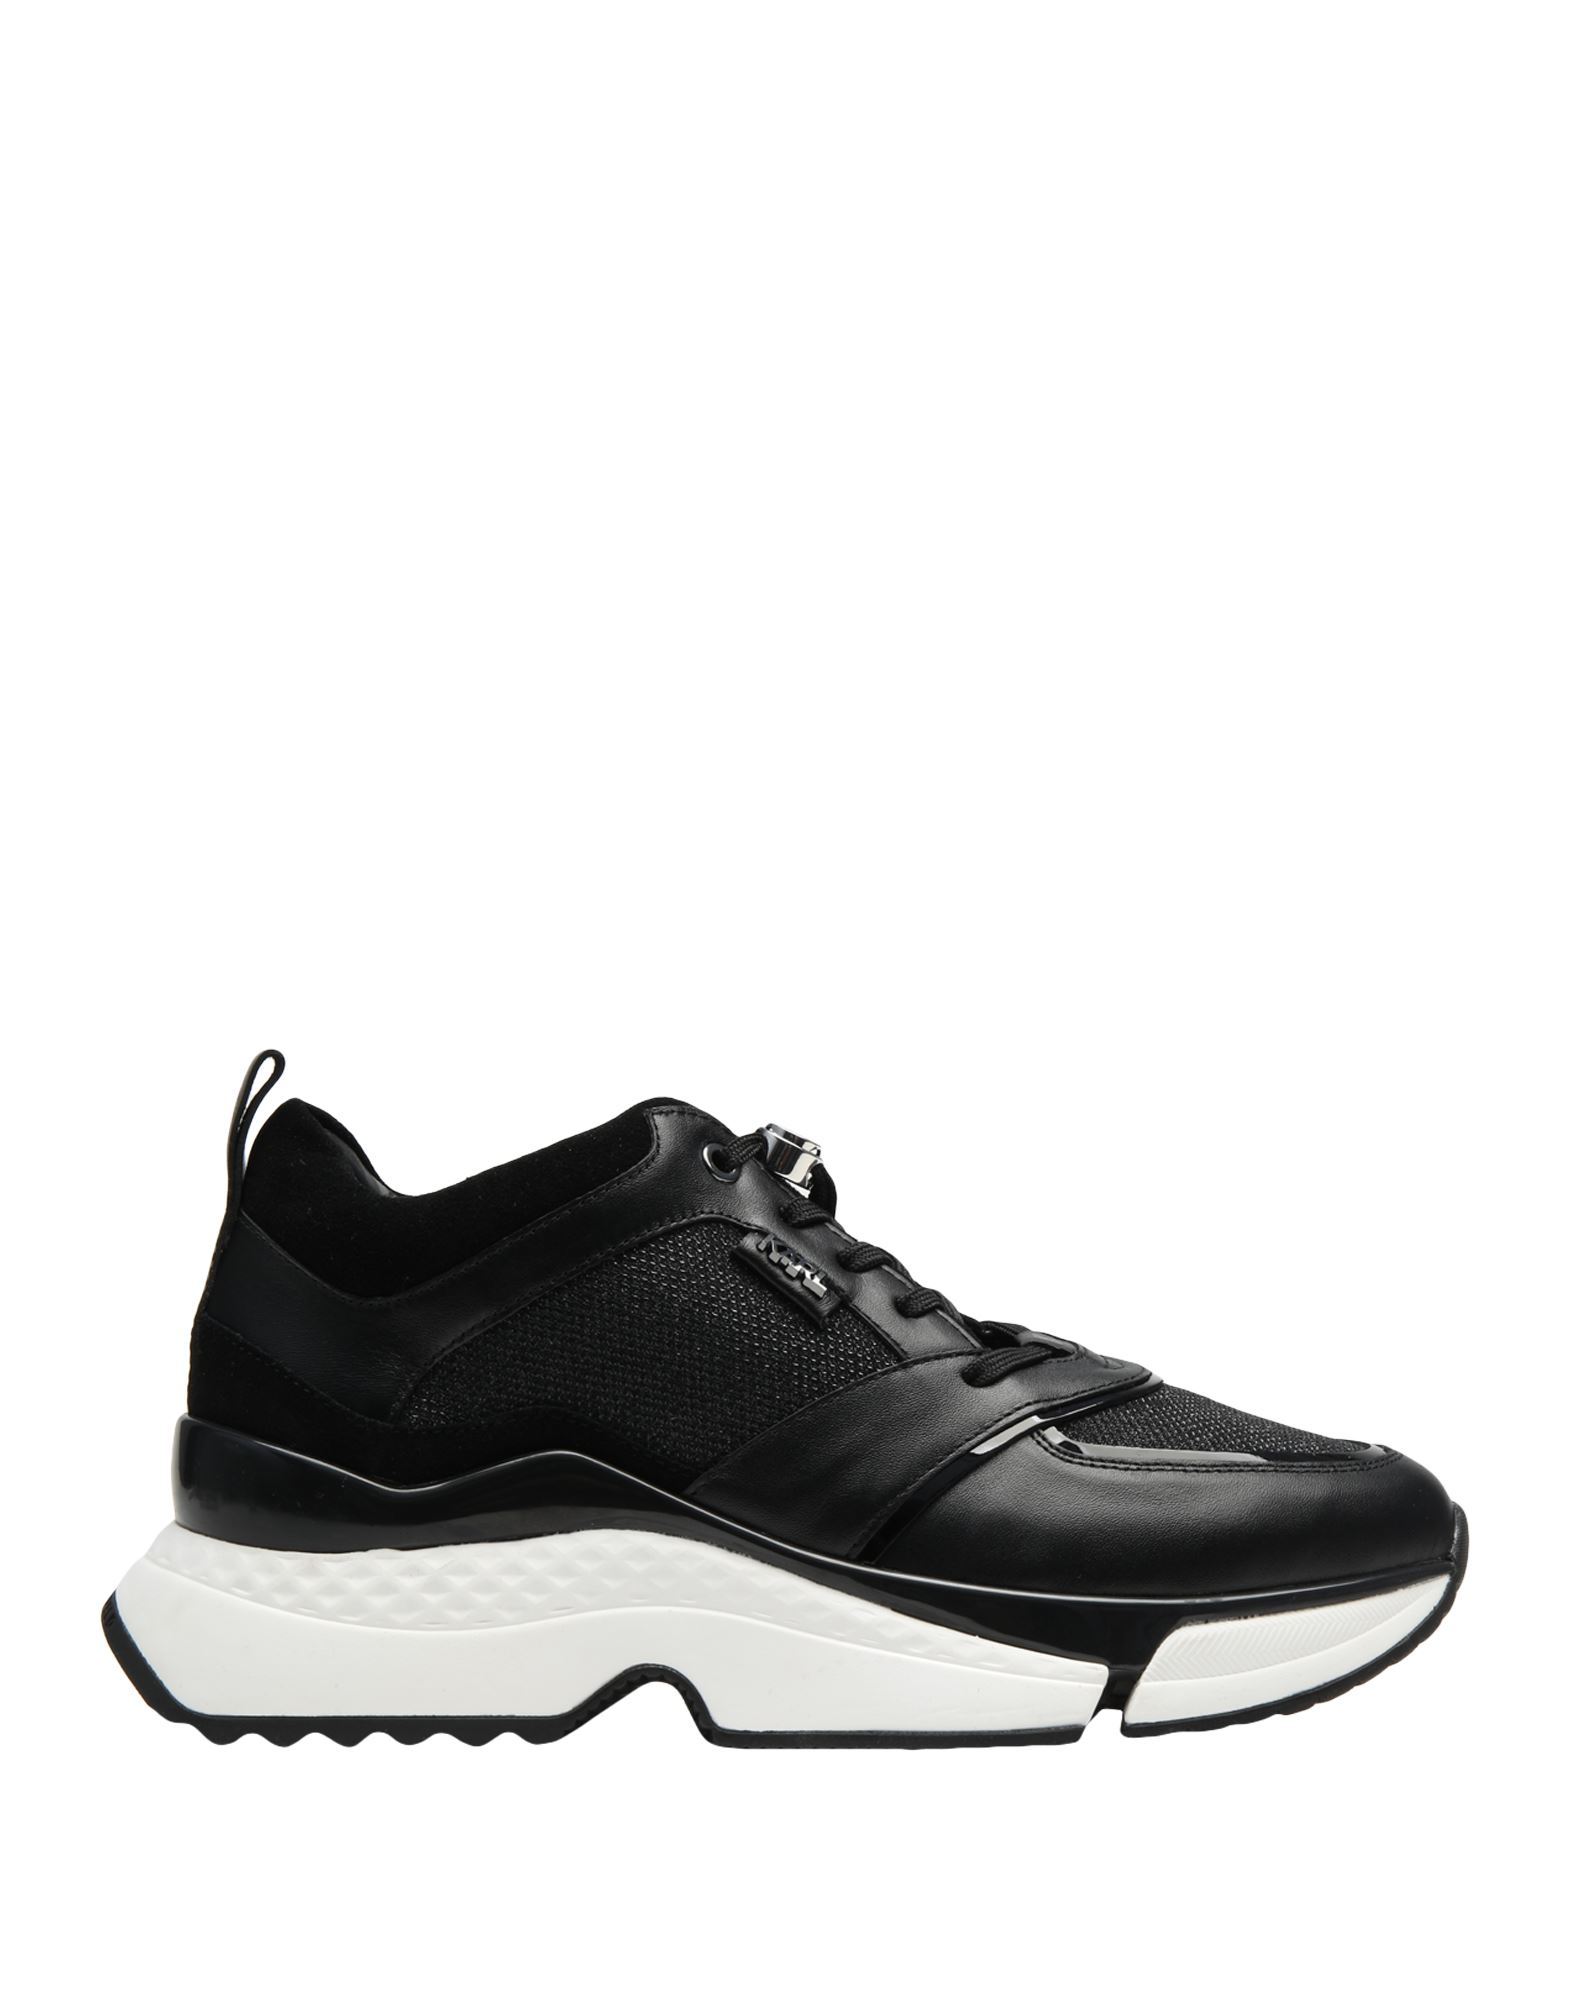 KARL LAGERFELD Низкие кеды и кроссовки fendi x karl lagerfeld низкие кеды и кроссовки